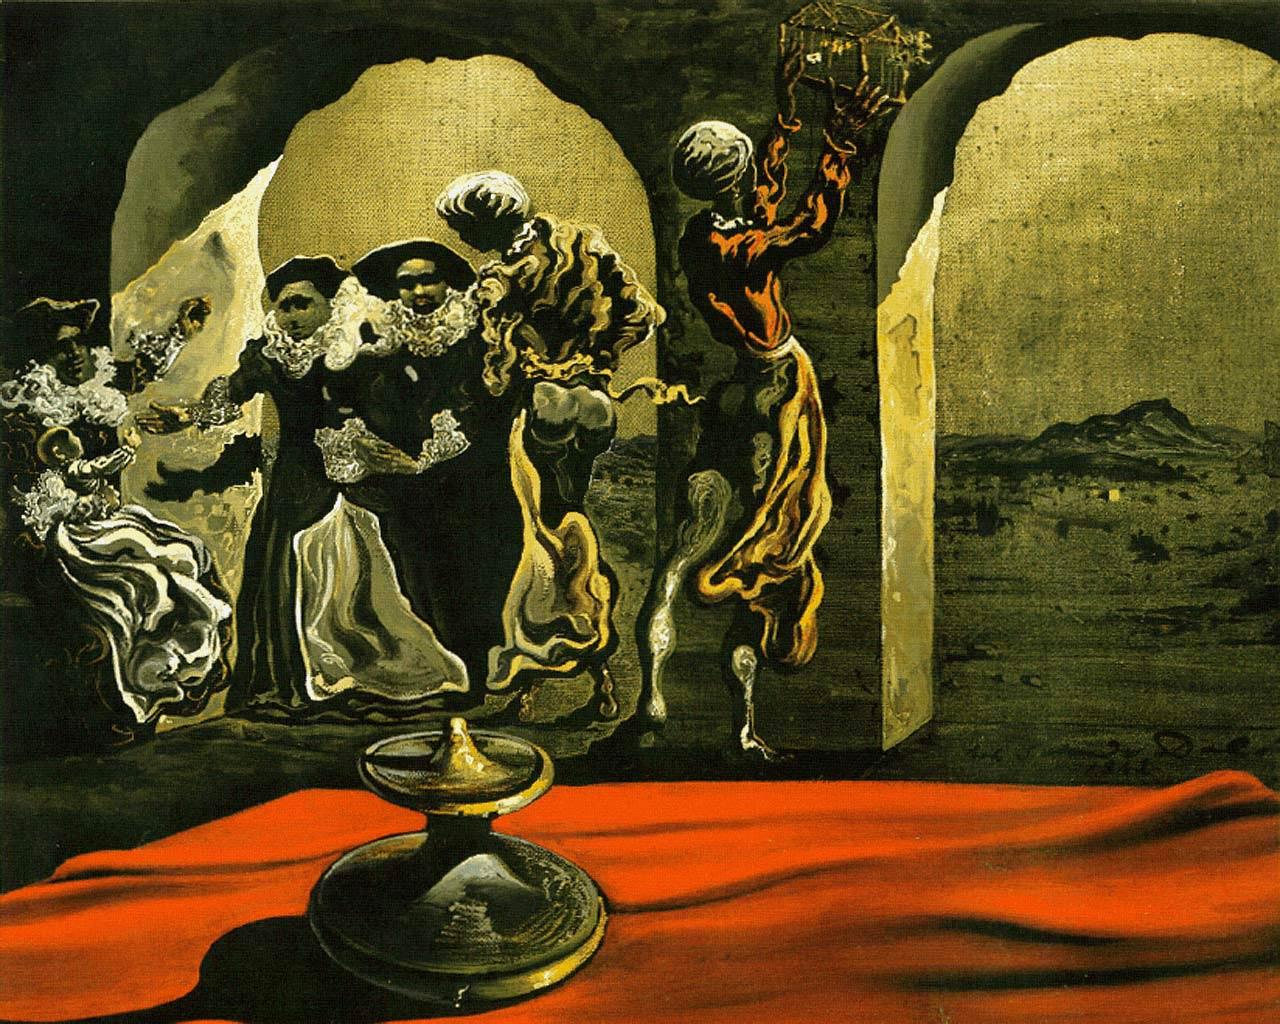 http://2.bp.blogspot.com/-_Ei9CLuVa7M/TpY8WxKfgpI/AAAAAAAAAic/pxZCXBe-1VM/s1600/Disappearing_Bust_of_Voltaire%252C_1941%252C_Salvador_Dali.jpg